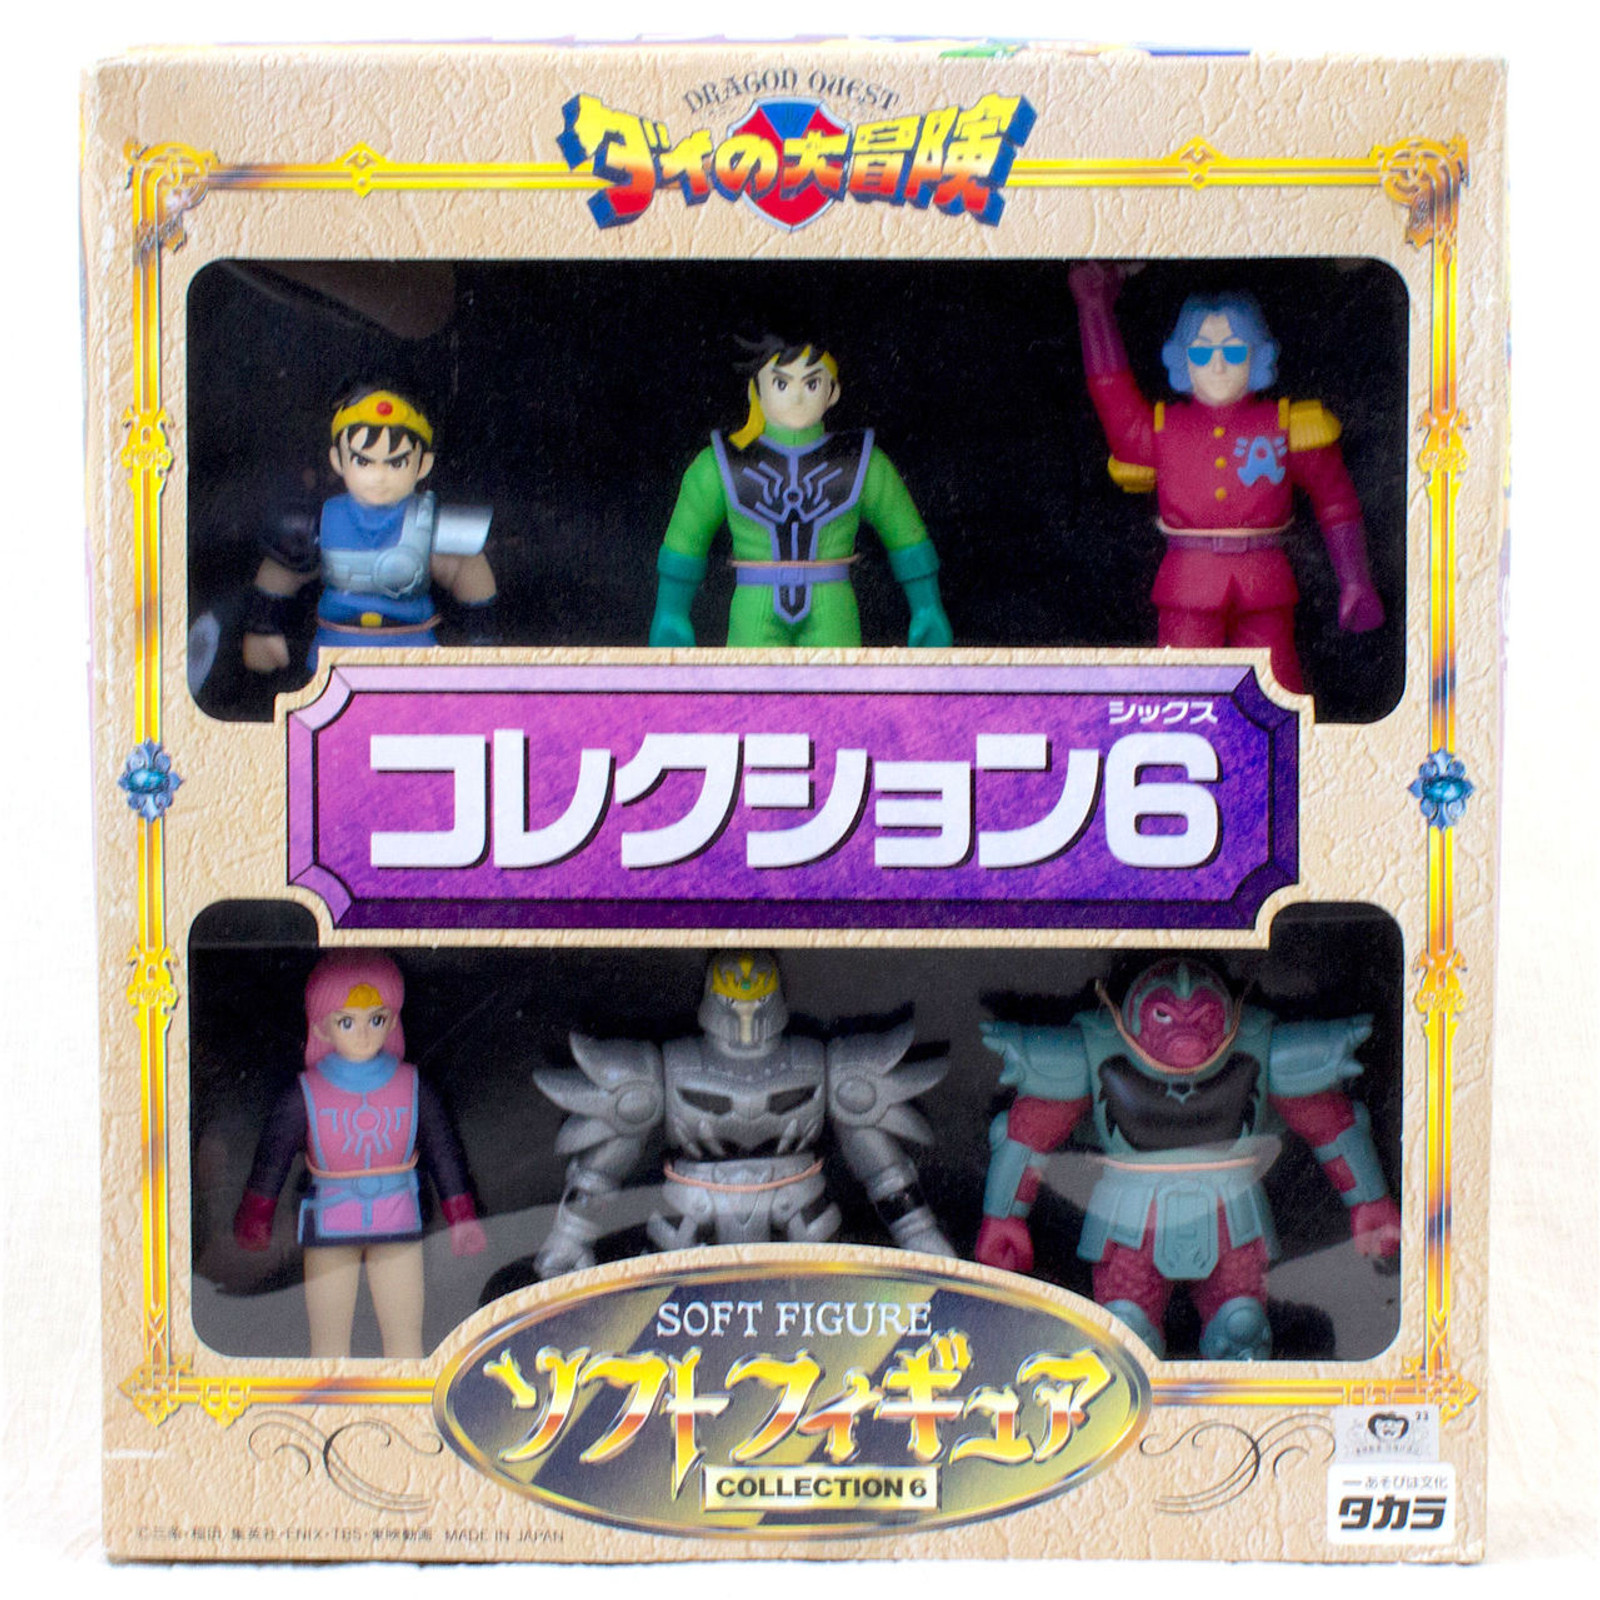 Dragon Quest: The Adventure of Dai Soft Figure Collection 6 [Dai / Pop / Maam / Hyunckel / Aban / Crocodyne] TAKARA JAPAN